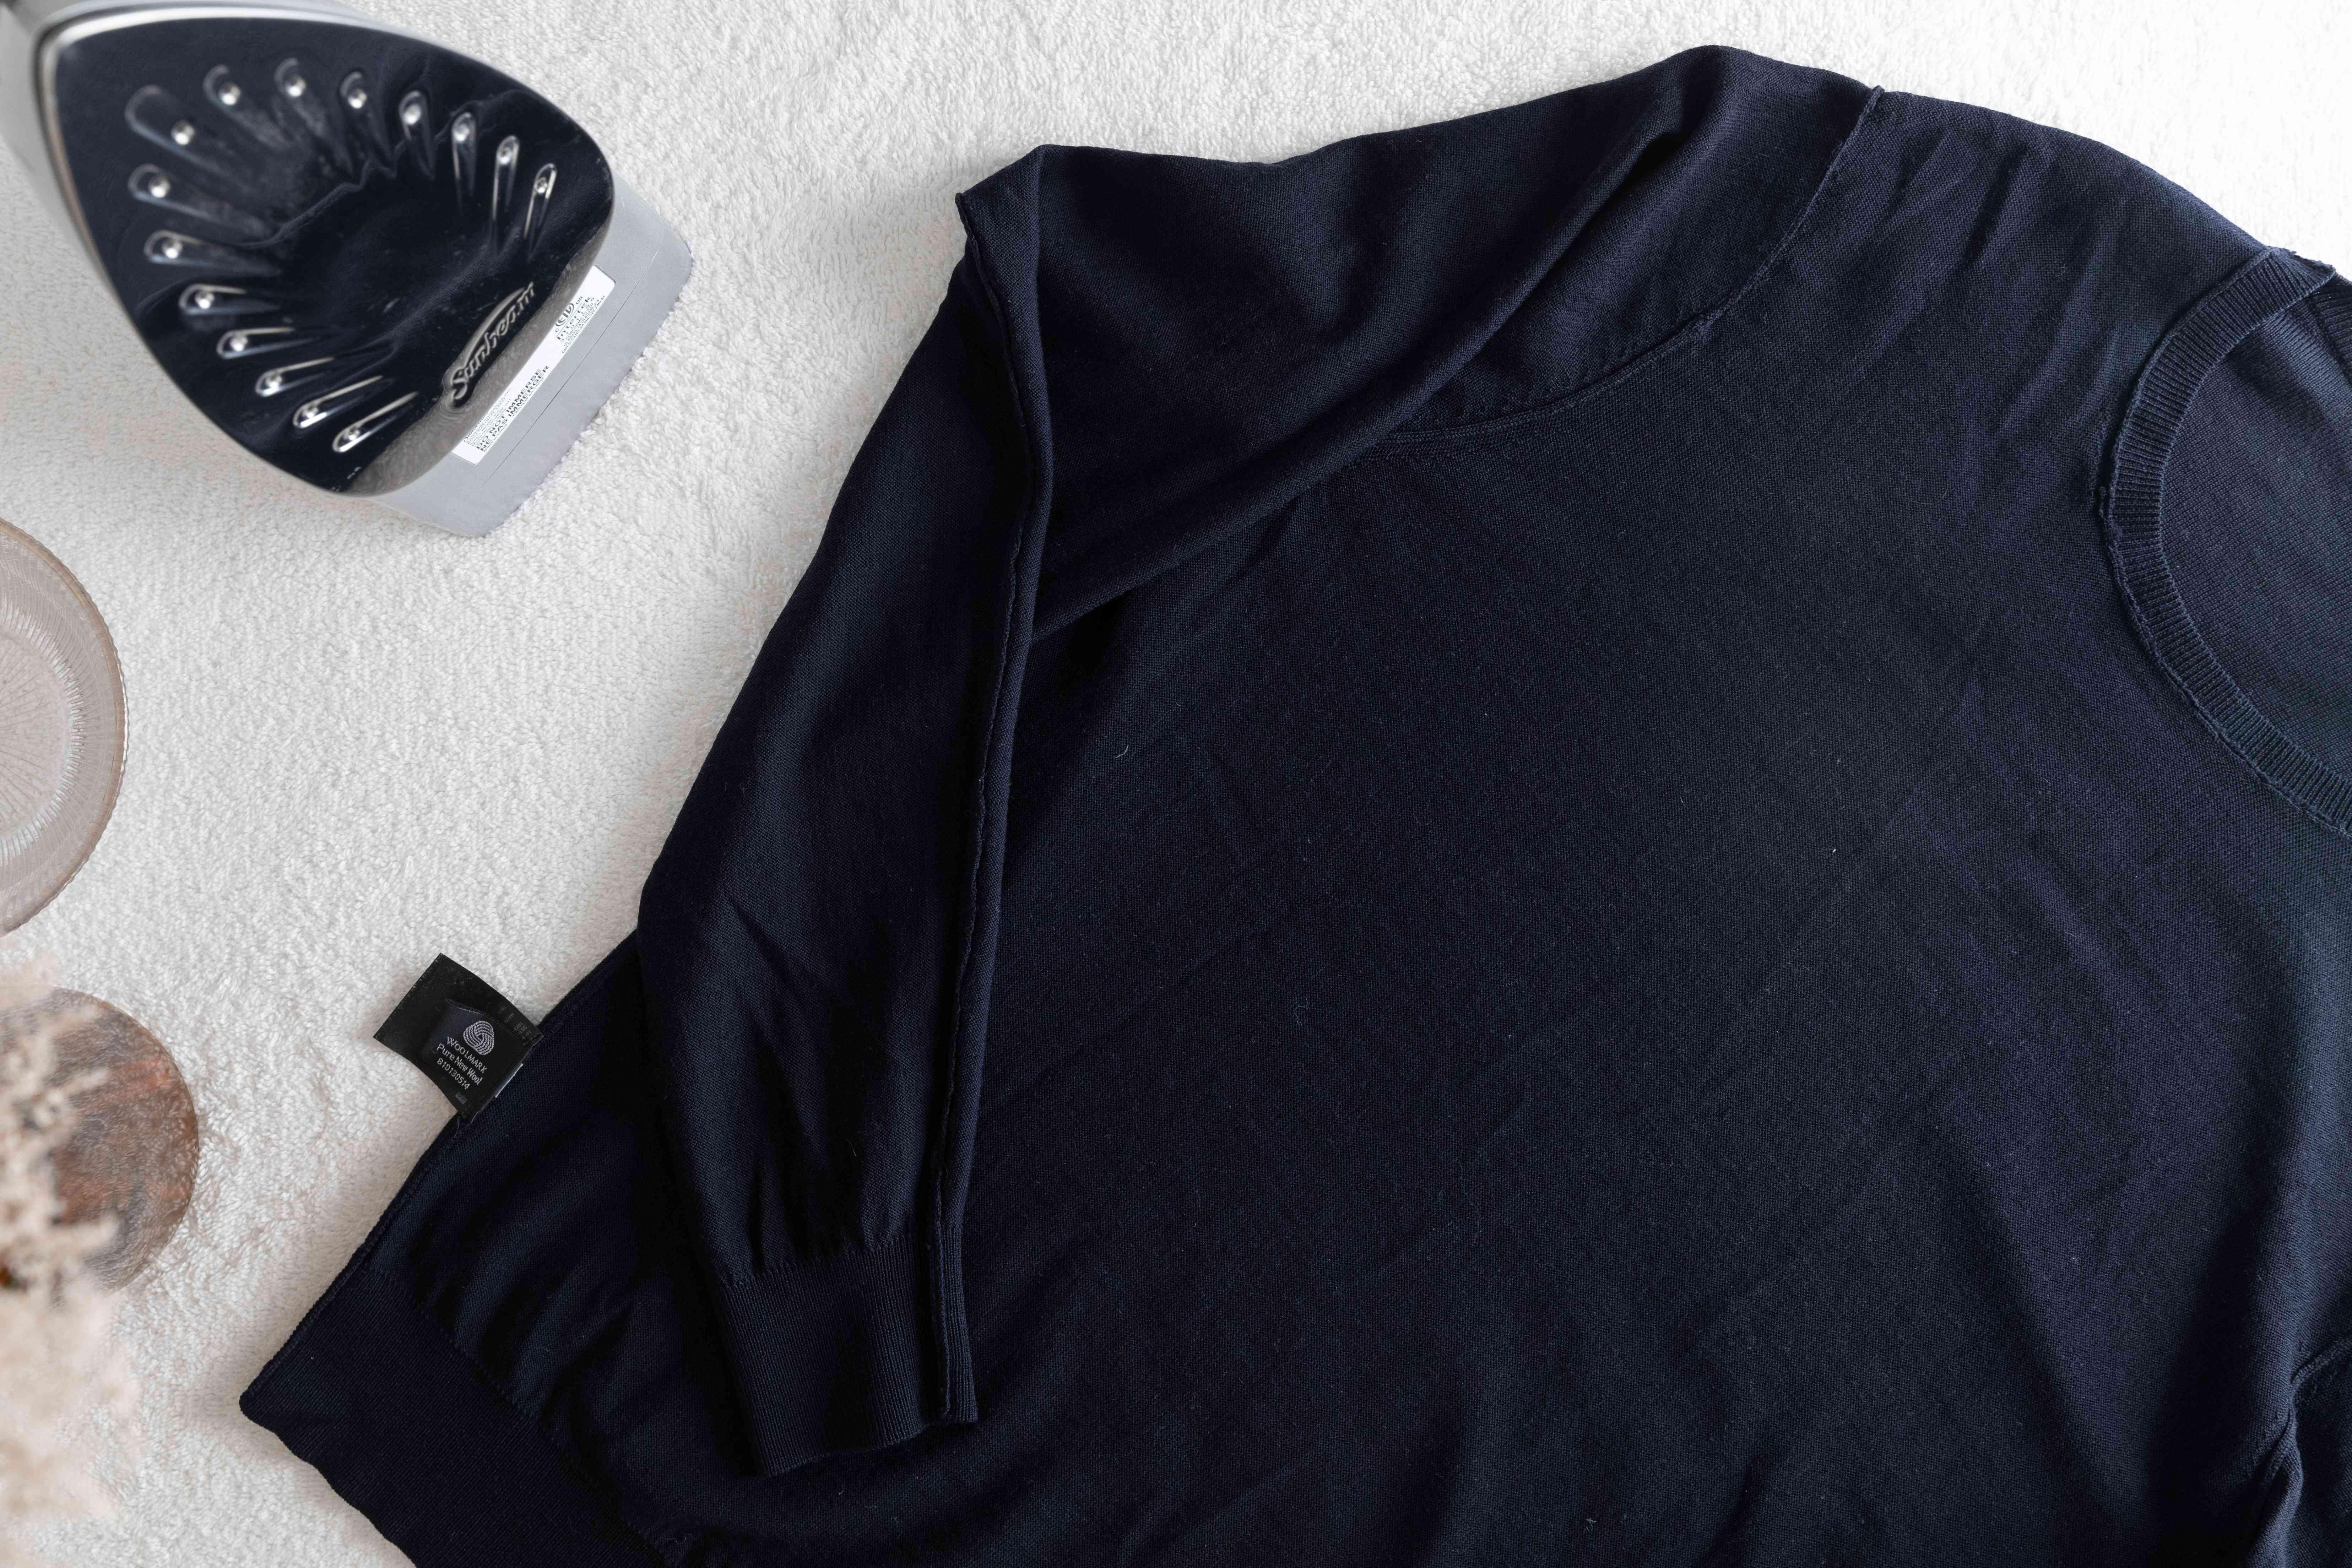 An inside-out sweater next to an iron